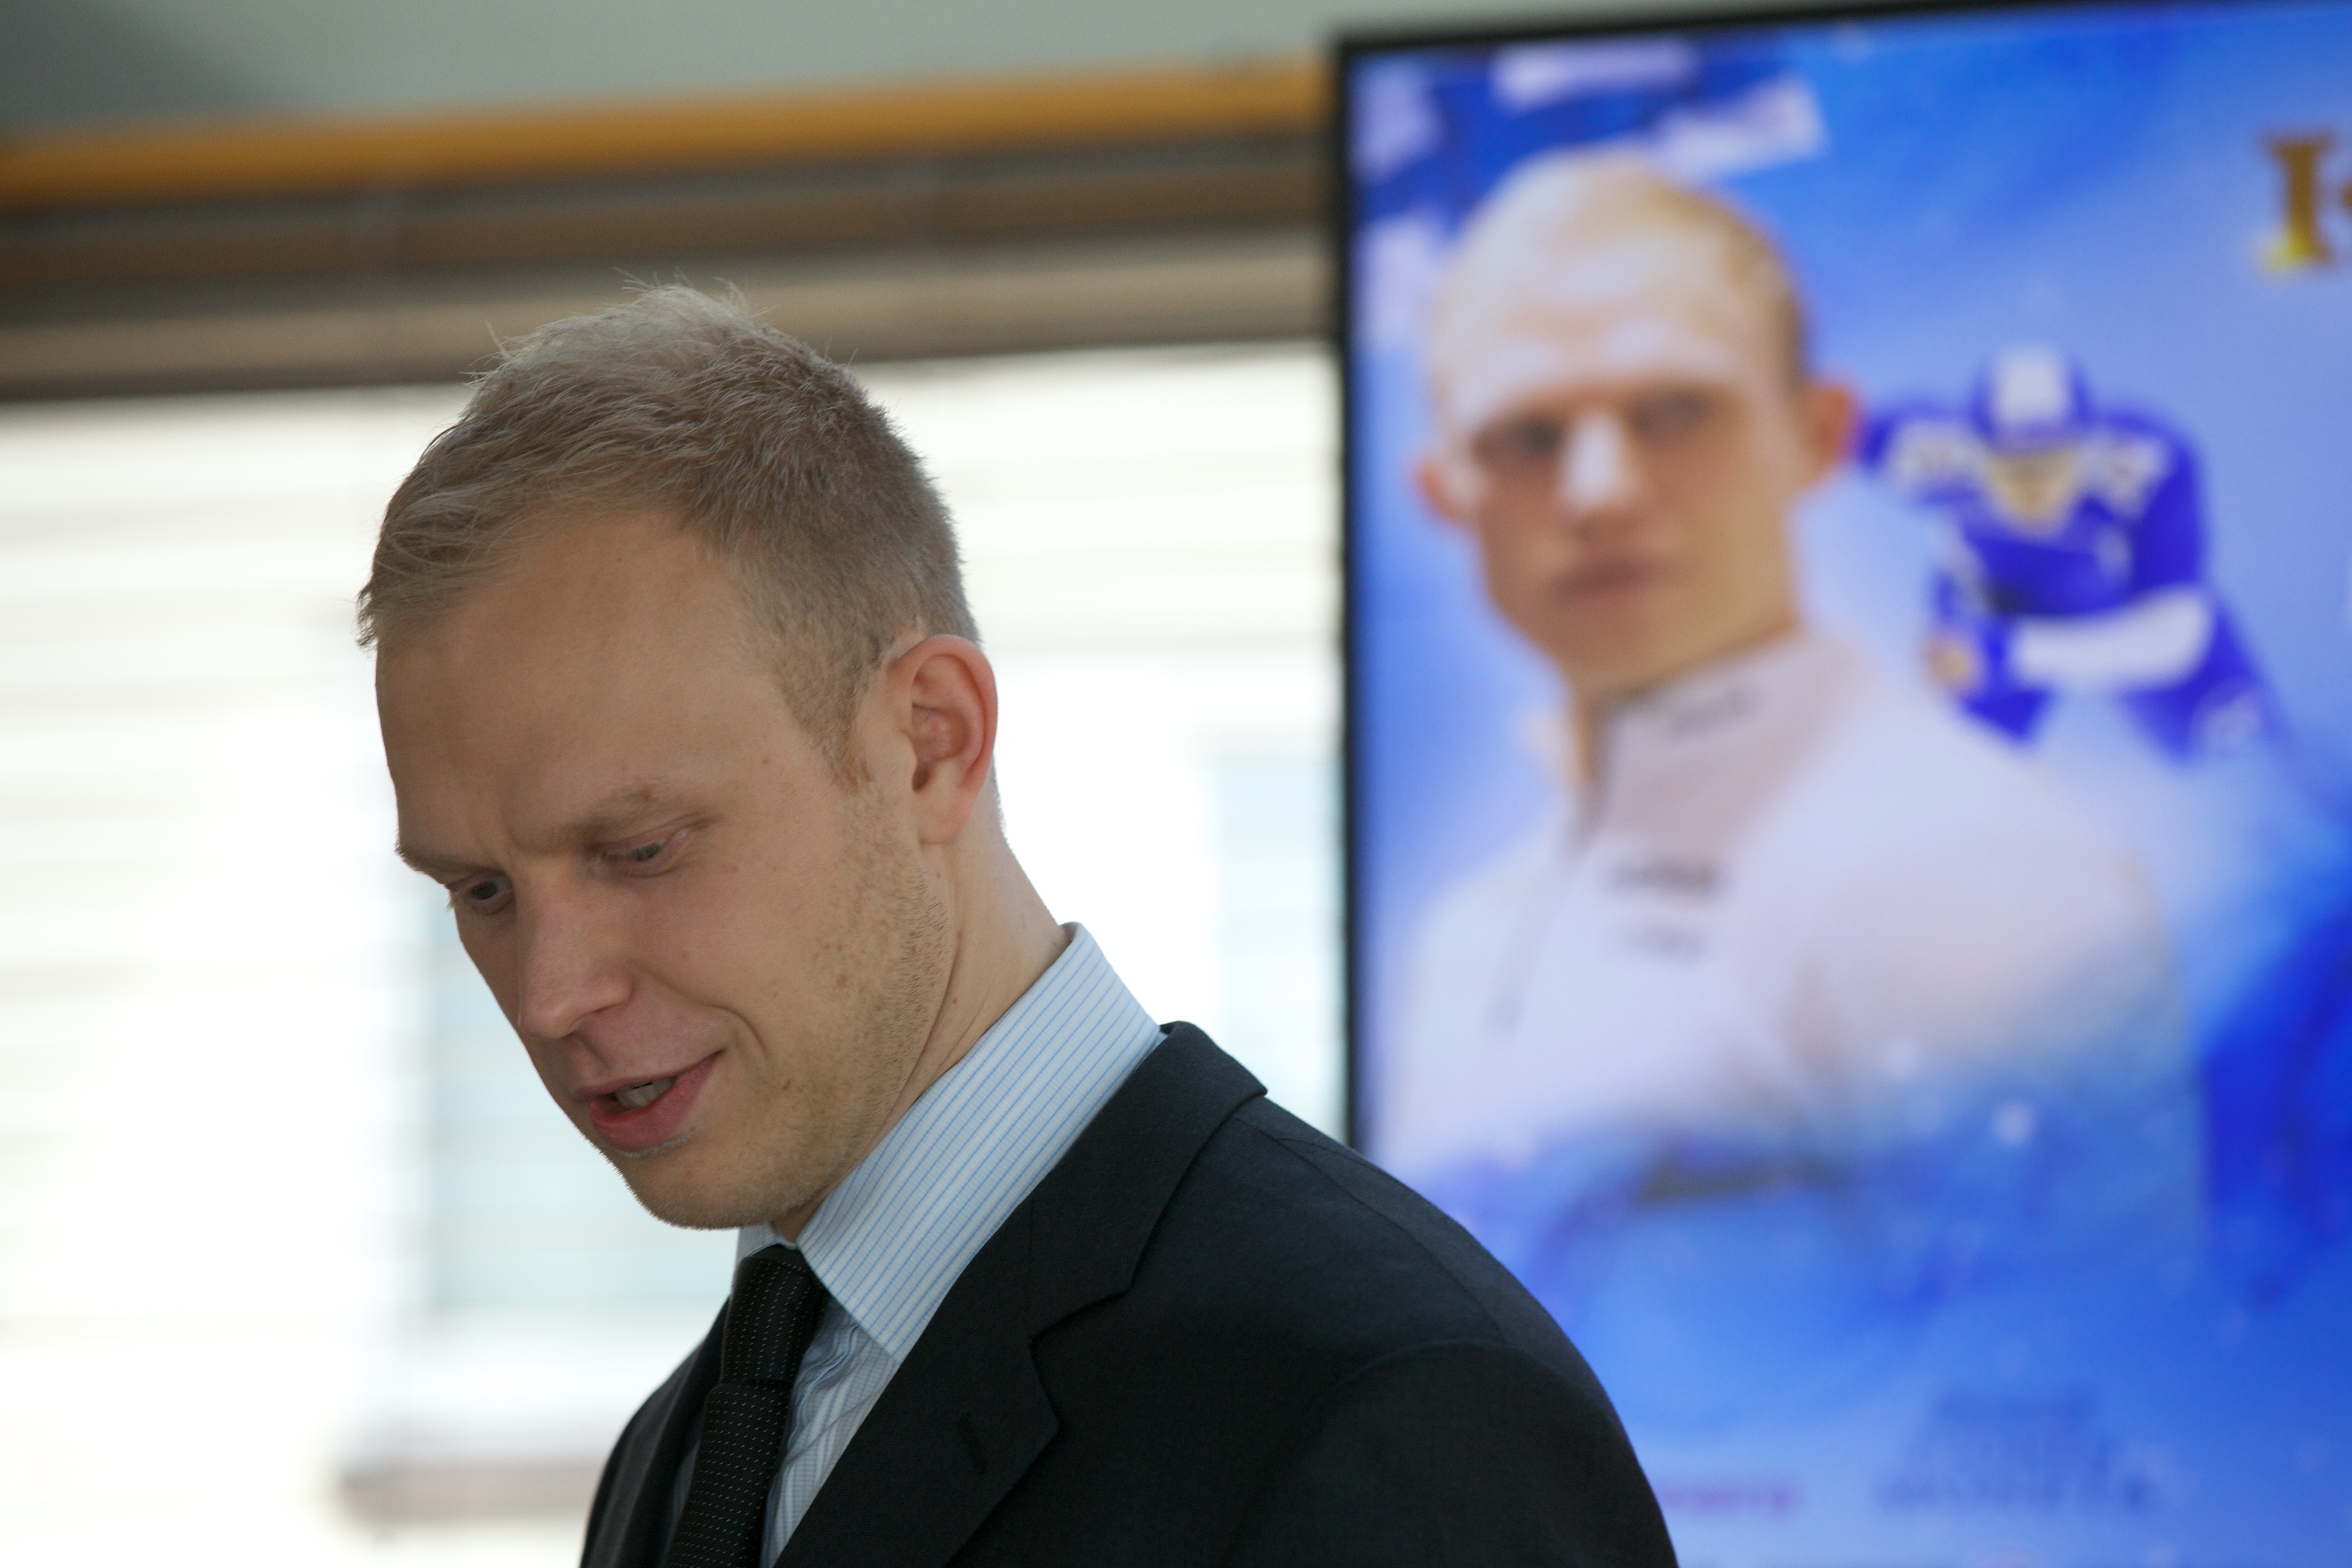 And former world record holder in speed skating, Pekka Koskela